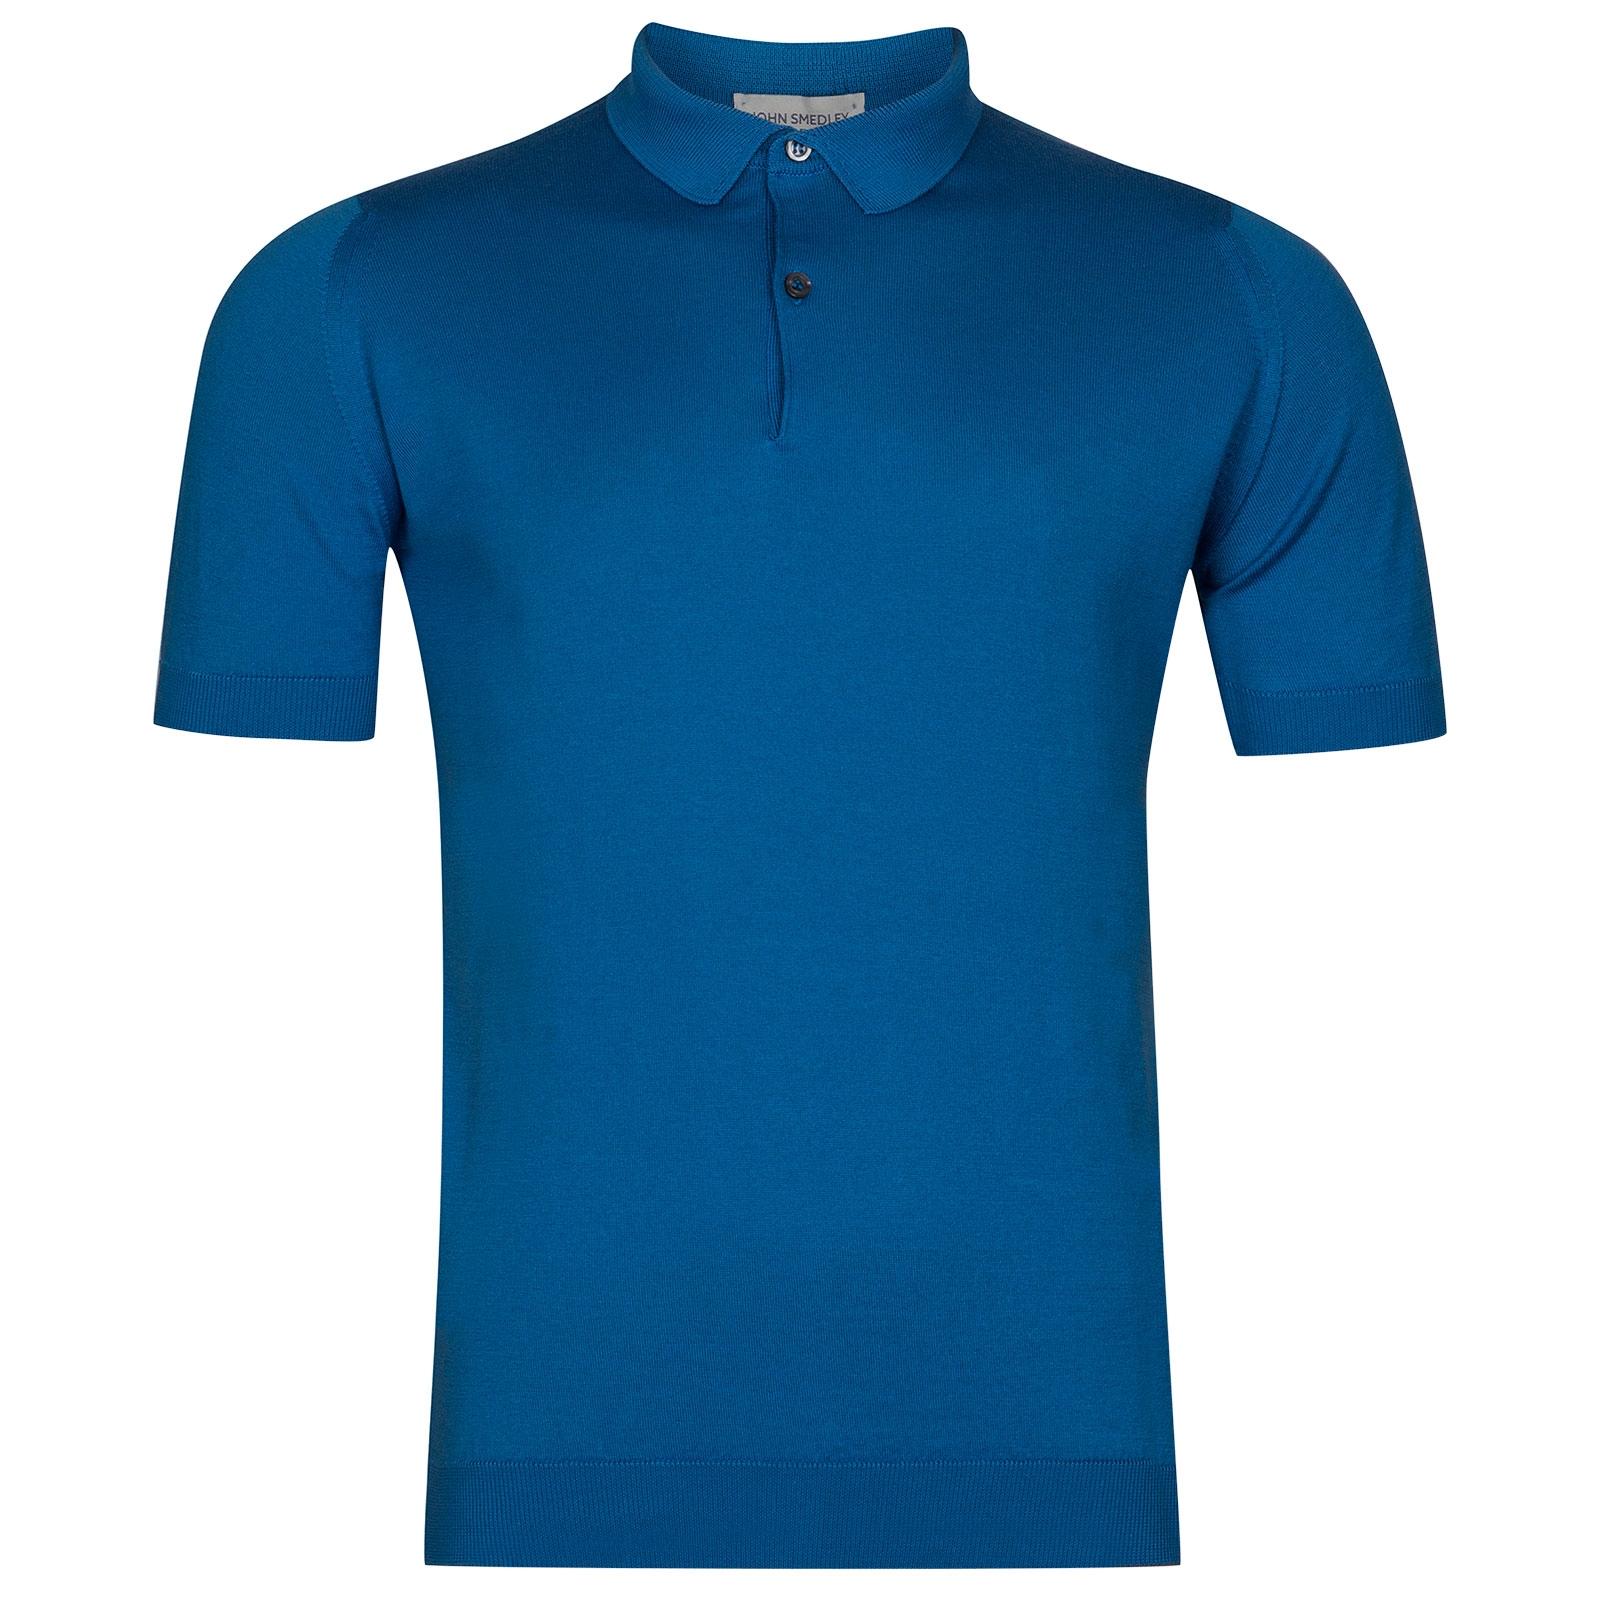 John Smedley Rhodes in Statice Blue Shirt-XXL